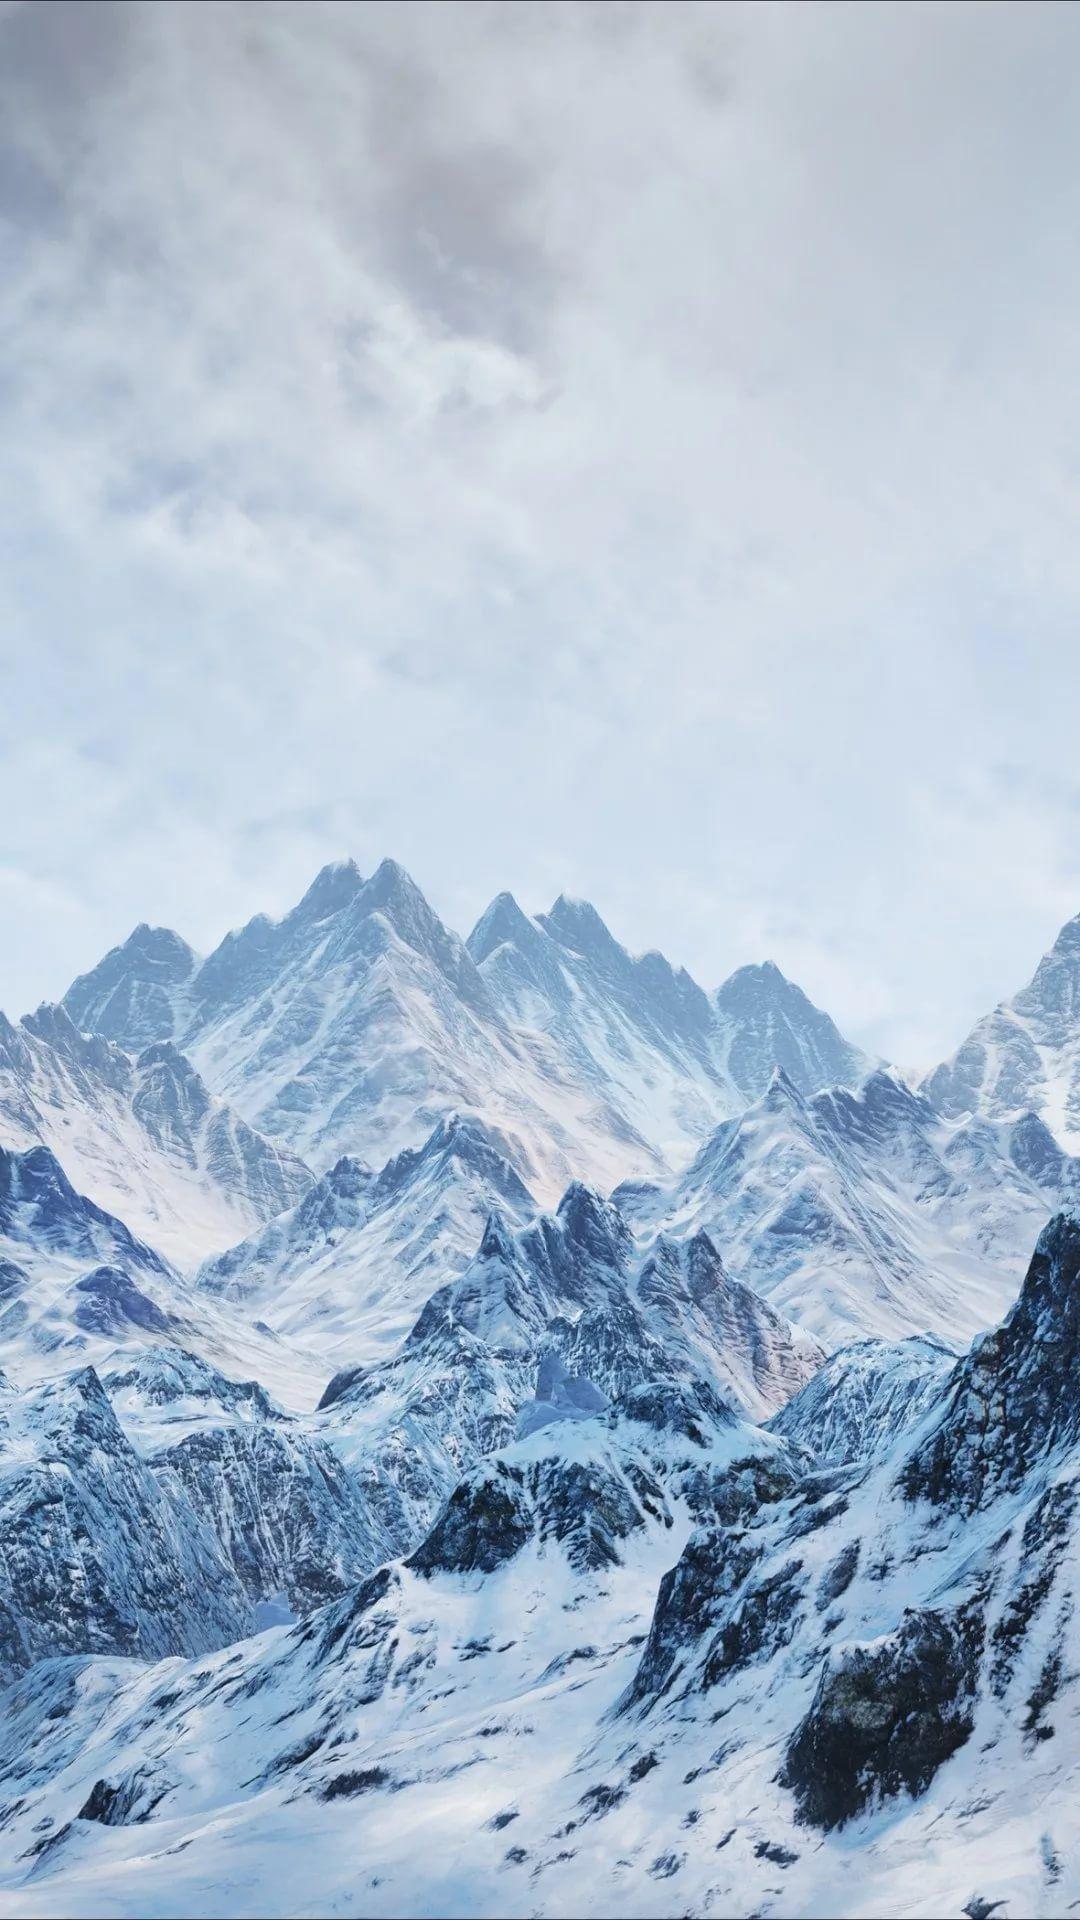 Mountain Wallpaper iPhone hd